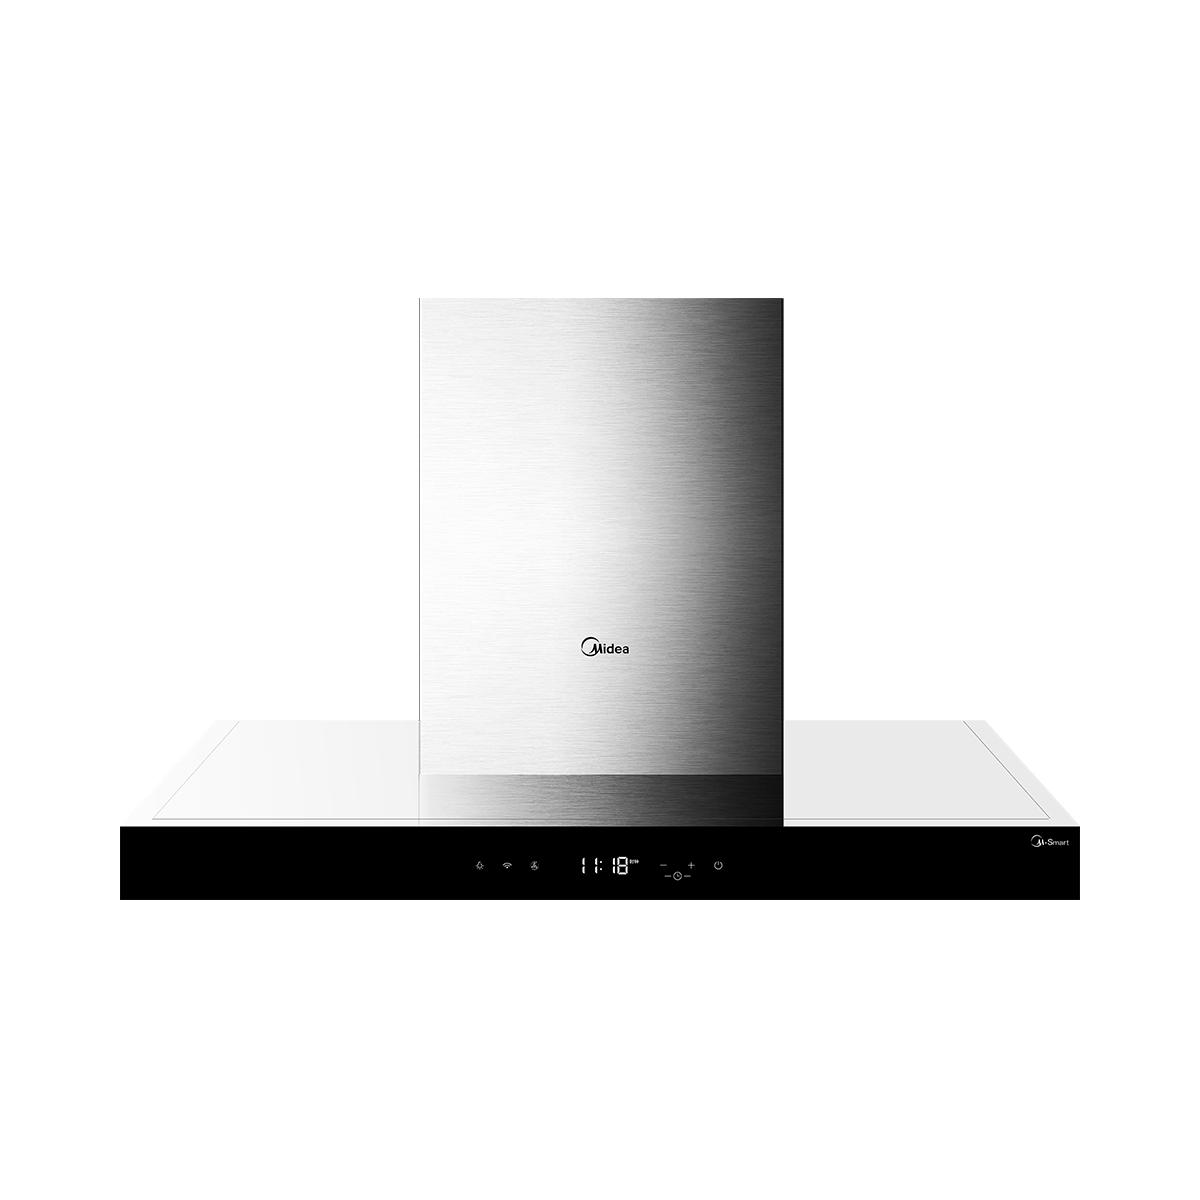 Midea/美的 CXW-200-DT520RW吸油烟机(油烟机) 说明书.pdf